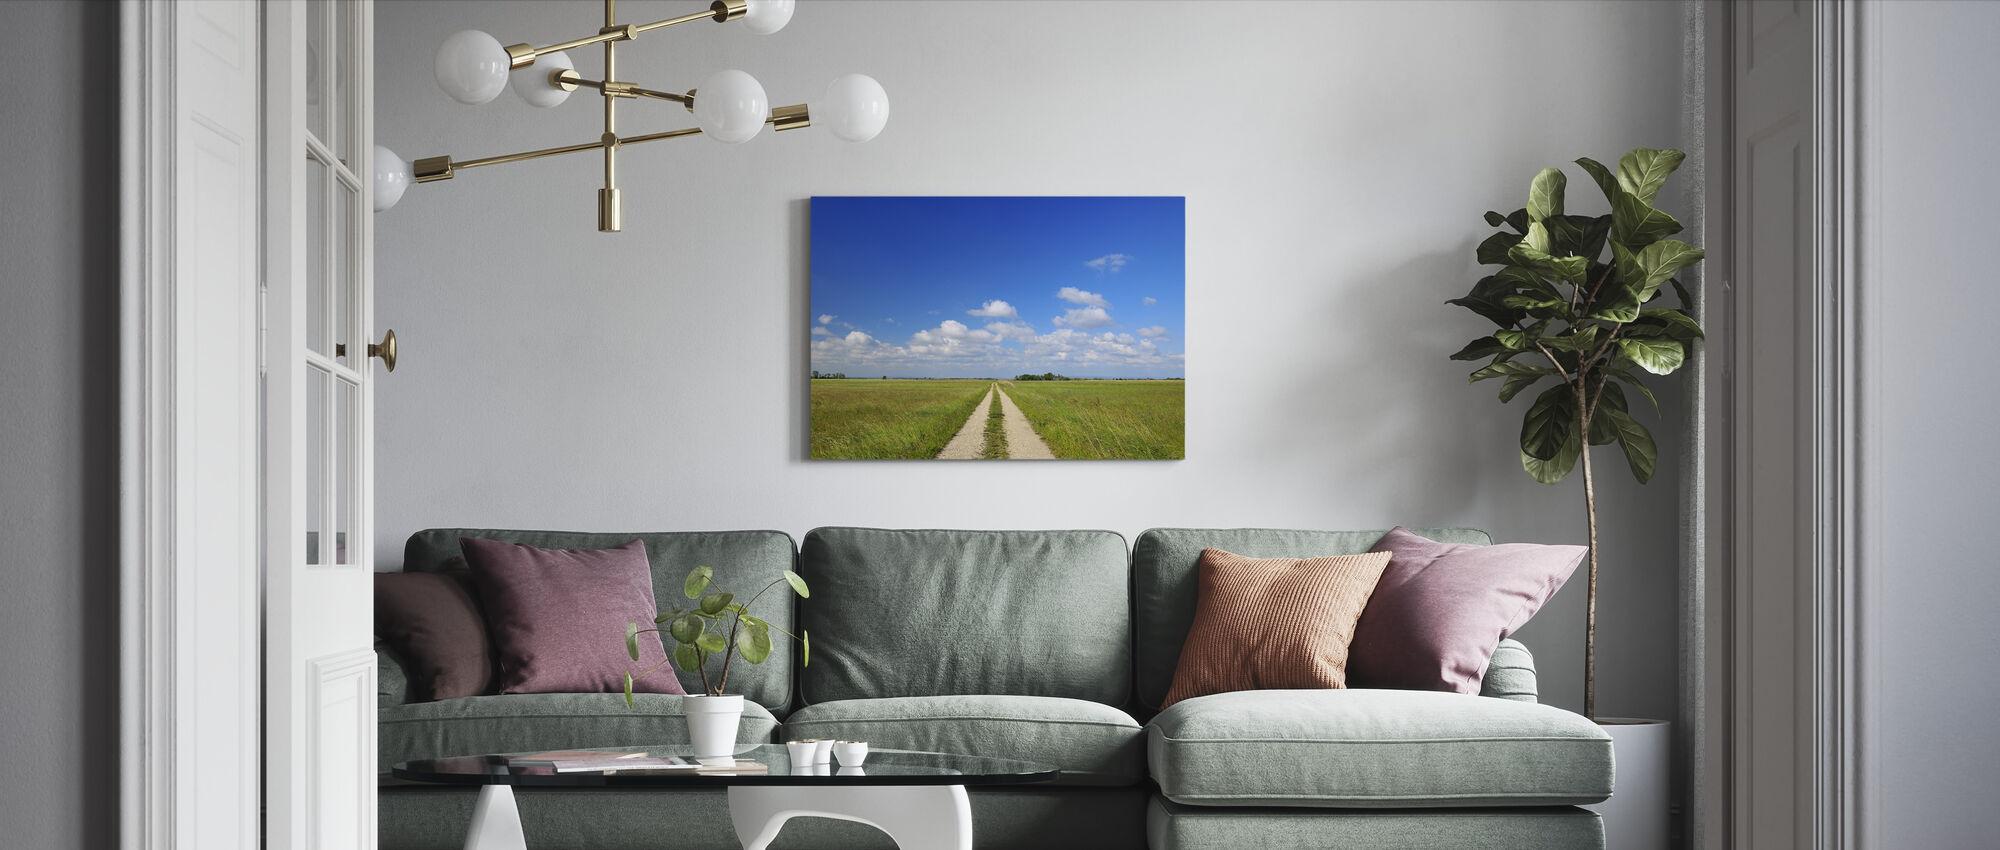 Polku läpi niitty - Canvastaulu - Olohuone